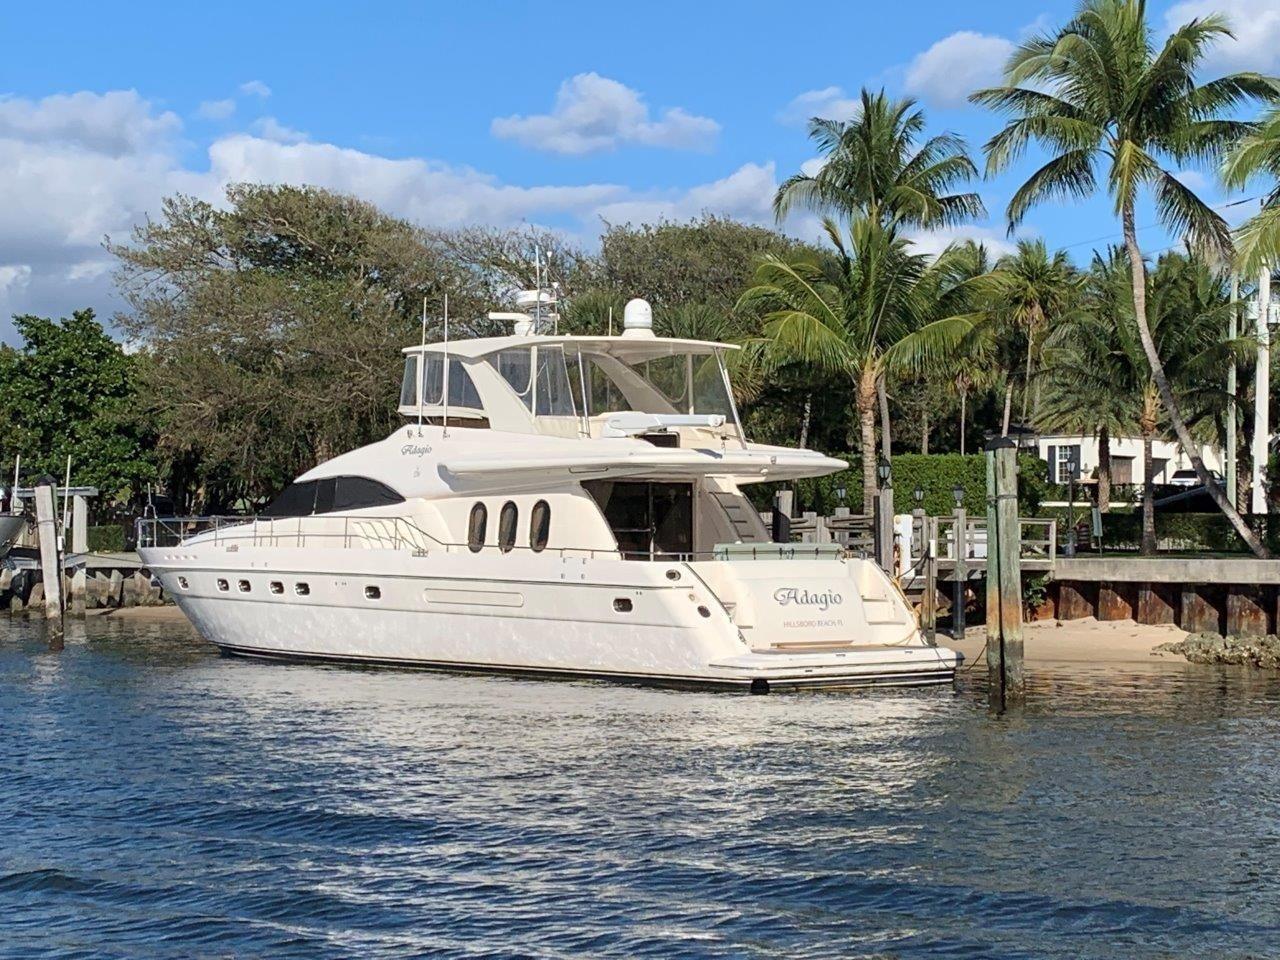 2000 Used Princess Motor Yacht For Sale 649 000 Hillsboro Beach